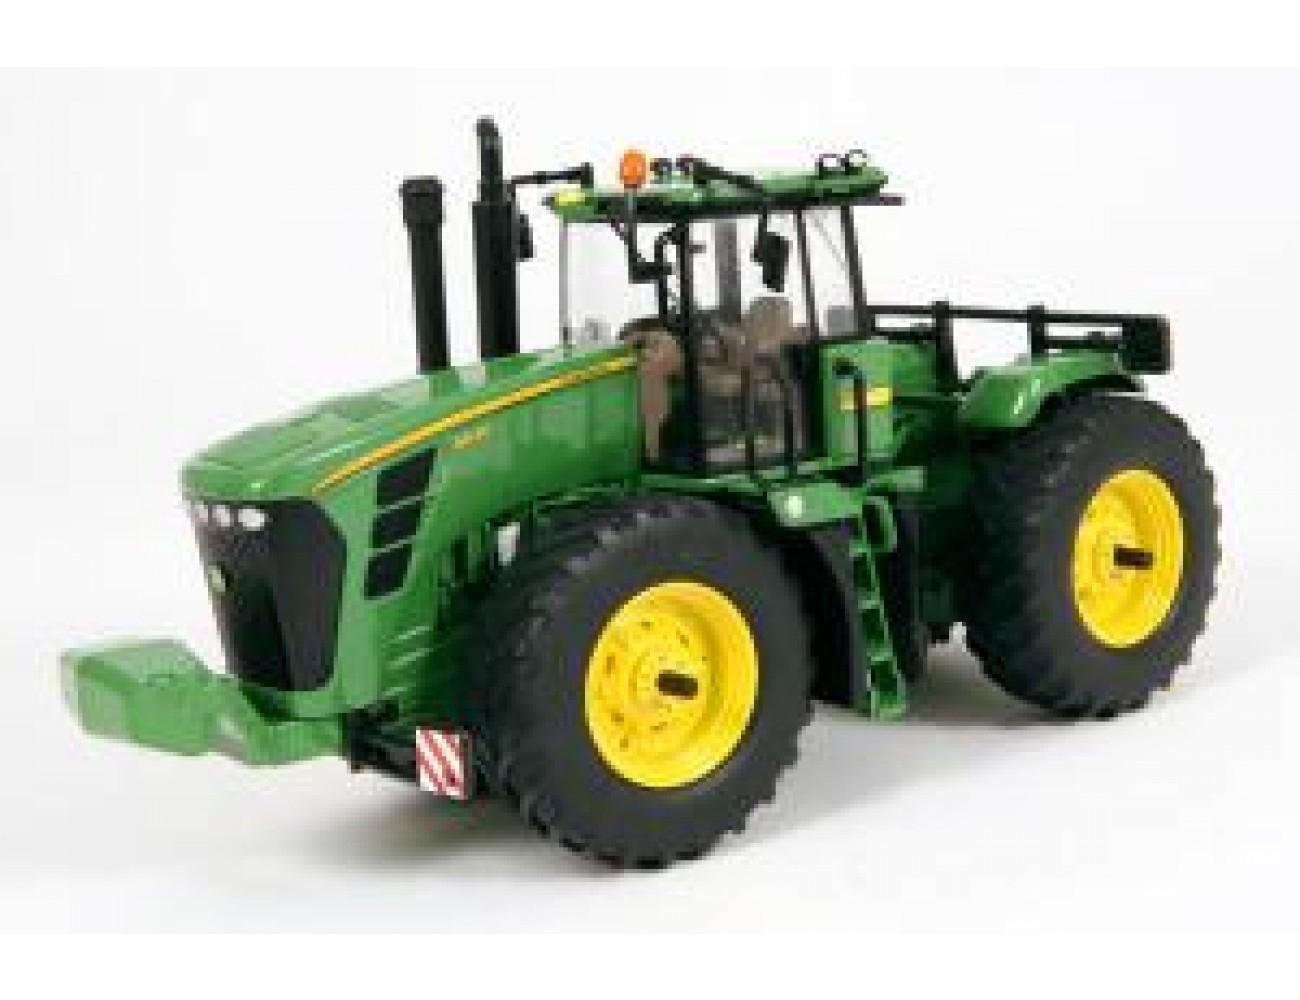 Tracteur Articulé John Deere 9530 à Dessin Animé De Tracteur John Deere